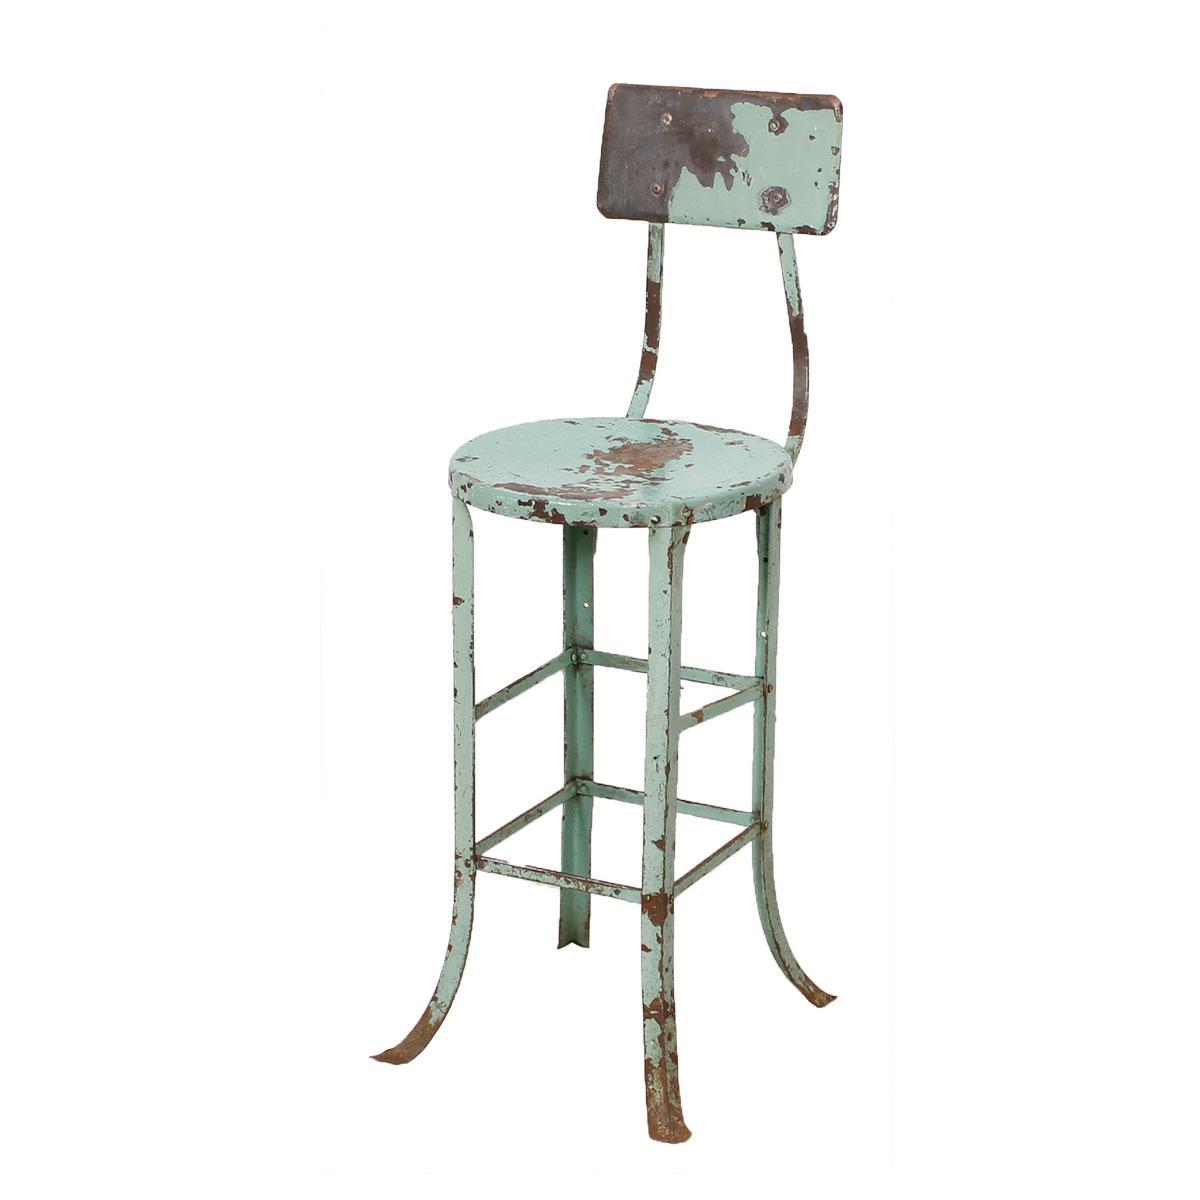 Vintage Industrial Rustic Green Bar Stool Chairish : 131e2173 b9ca 4302 bc25 1fcfc879e54caspectfitampwidth640ampheight640 from www.chairish.com size 640 x 640 jpeg 25kB